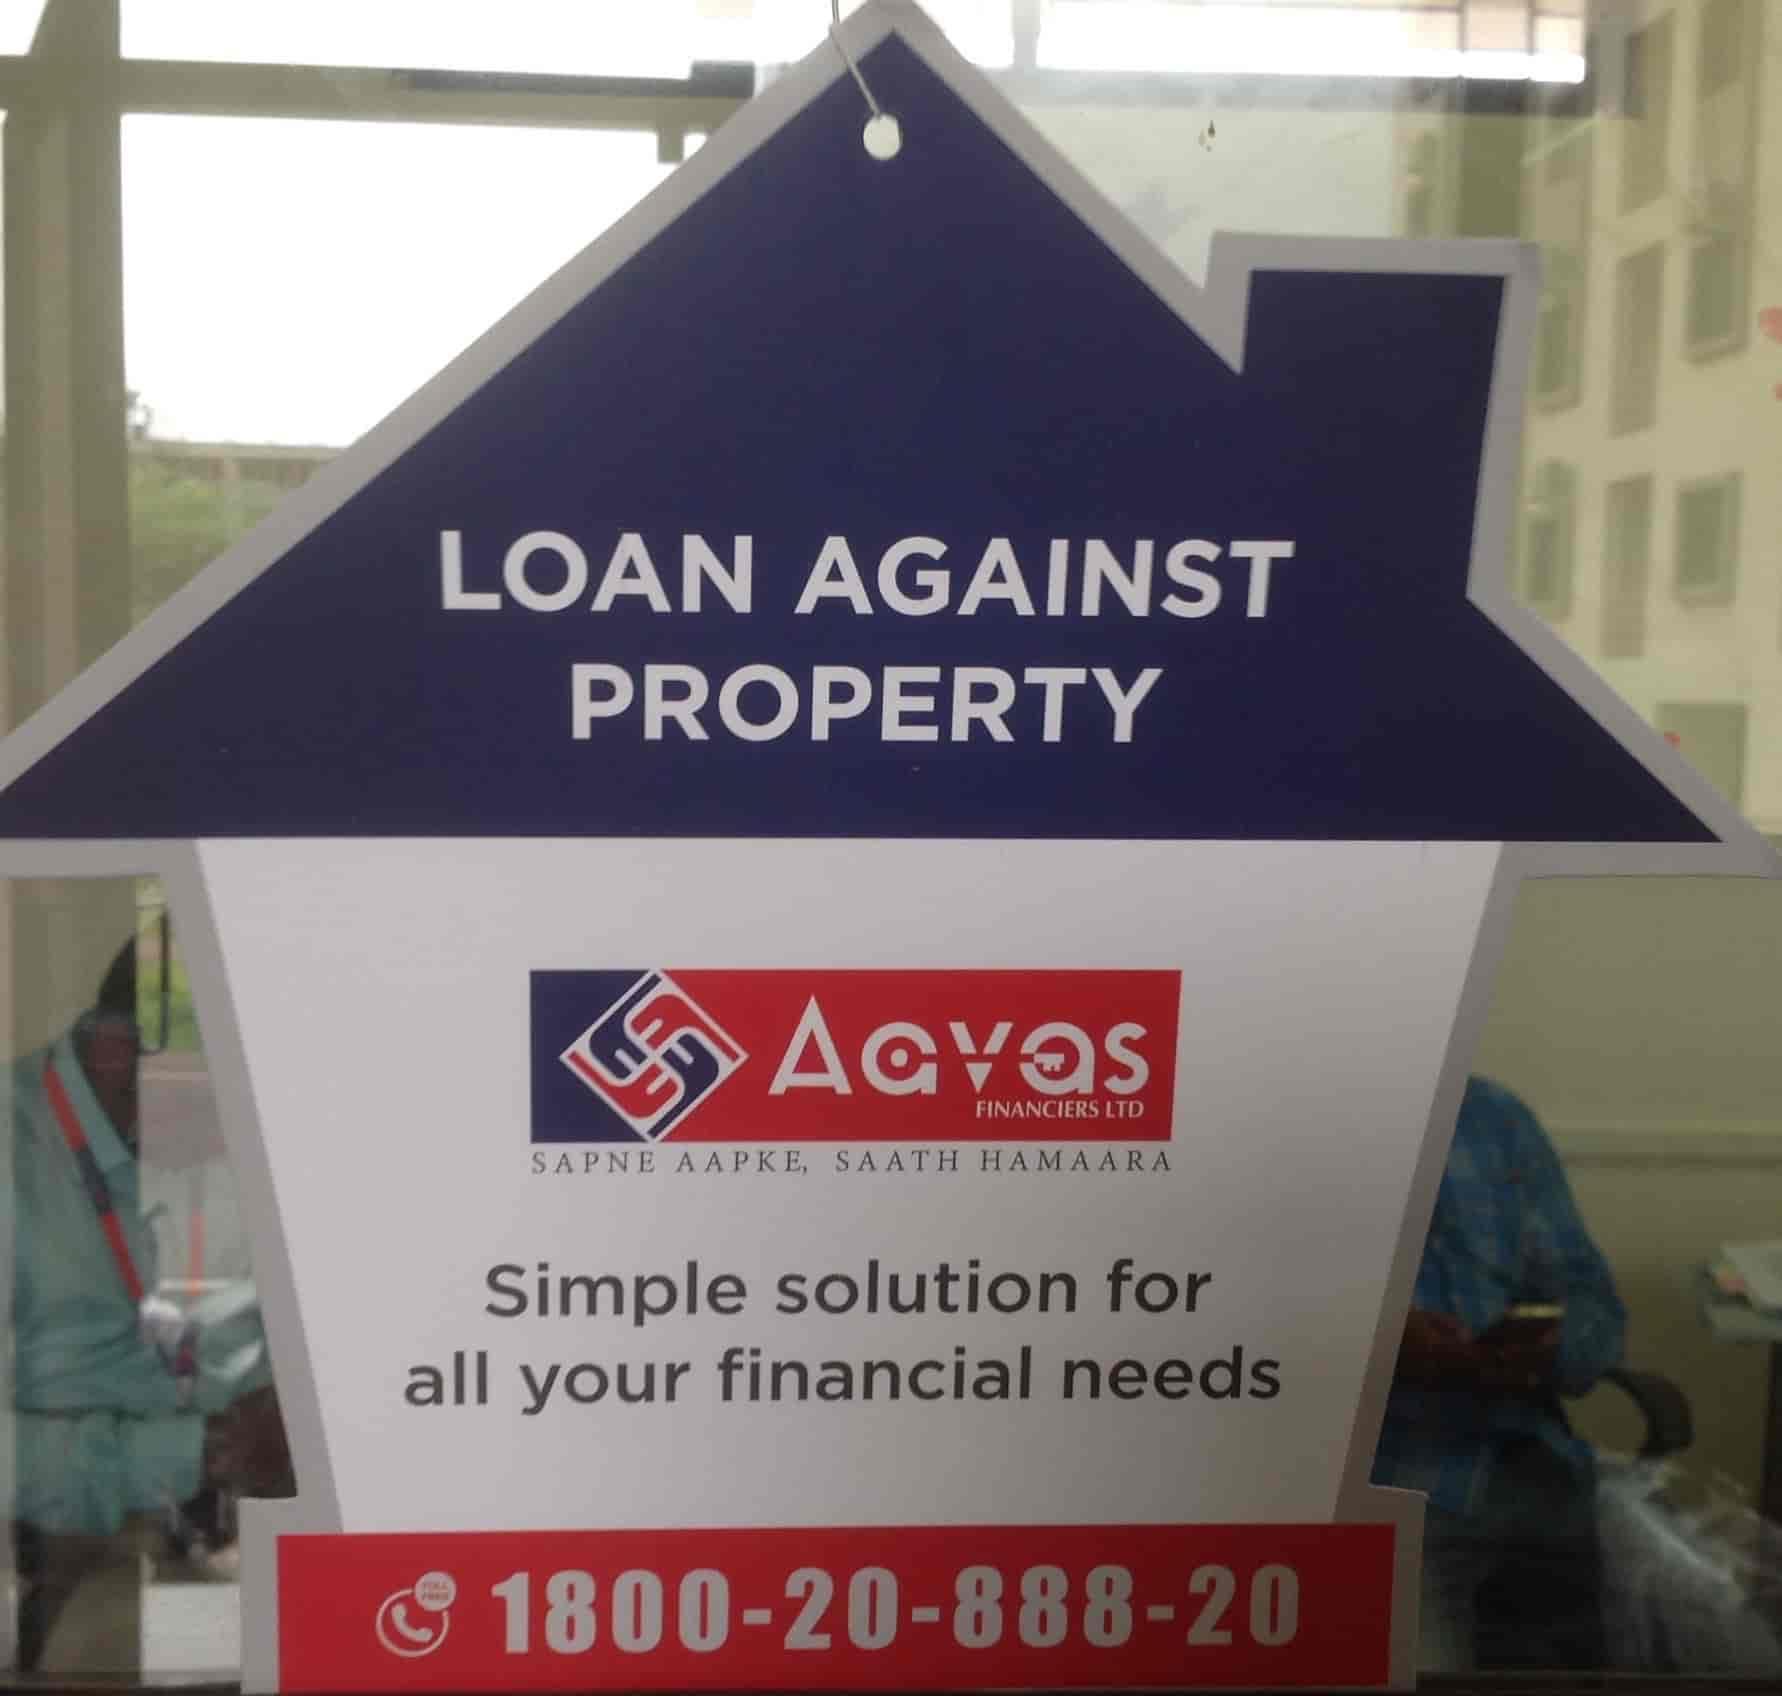 Aavas Financiers Ltd, Baramati HO - Home Loans in Baramati